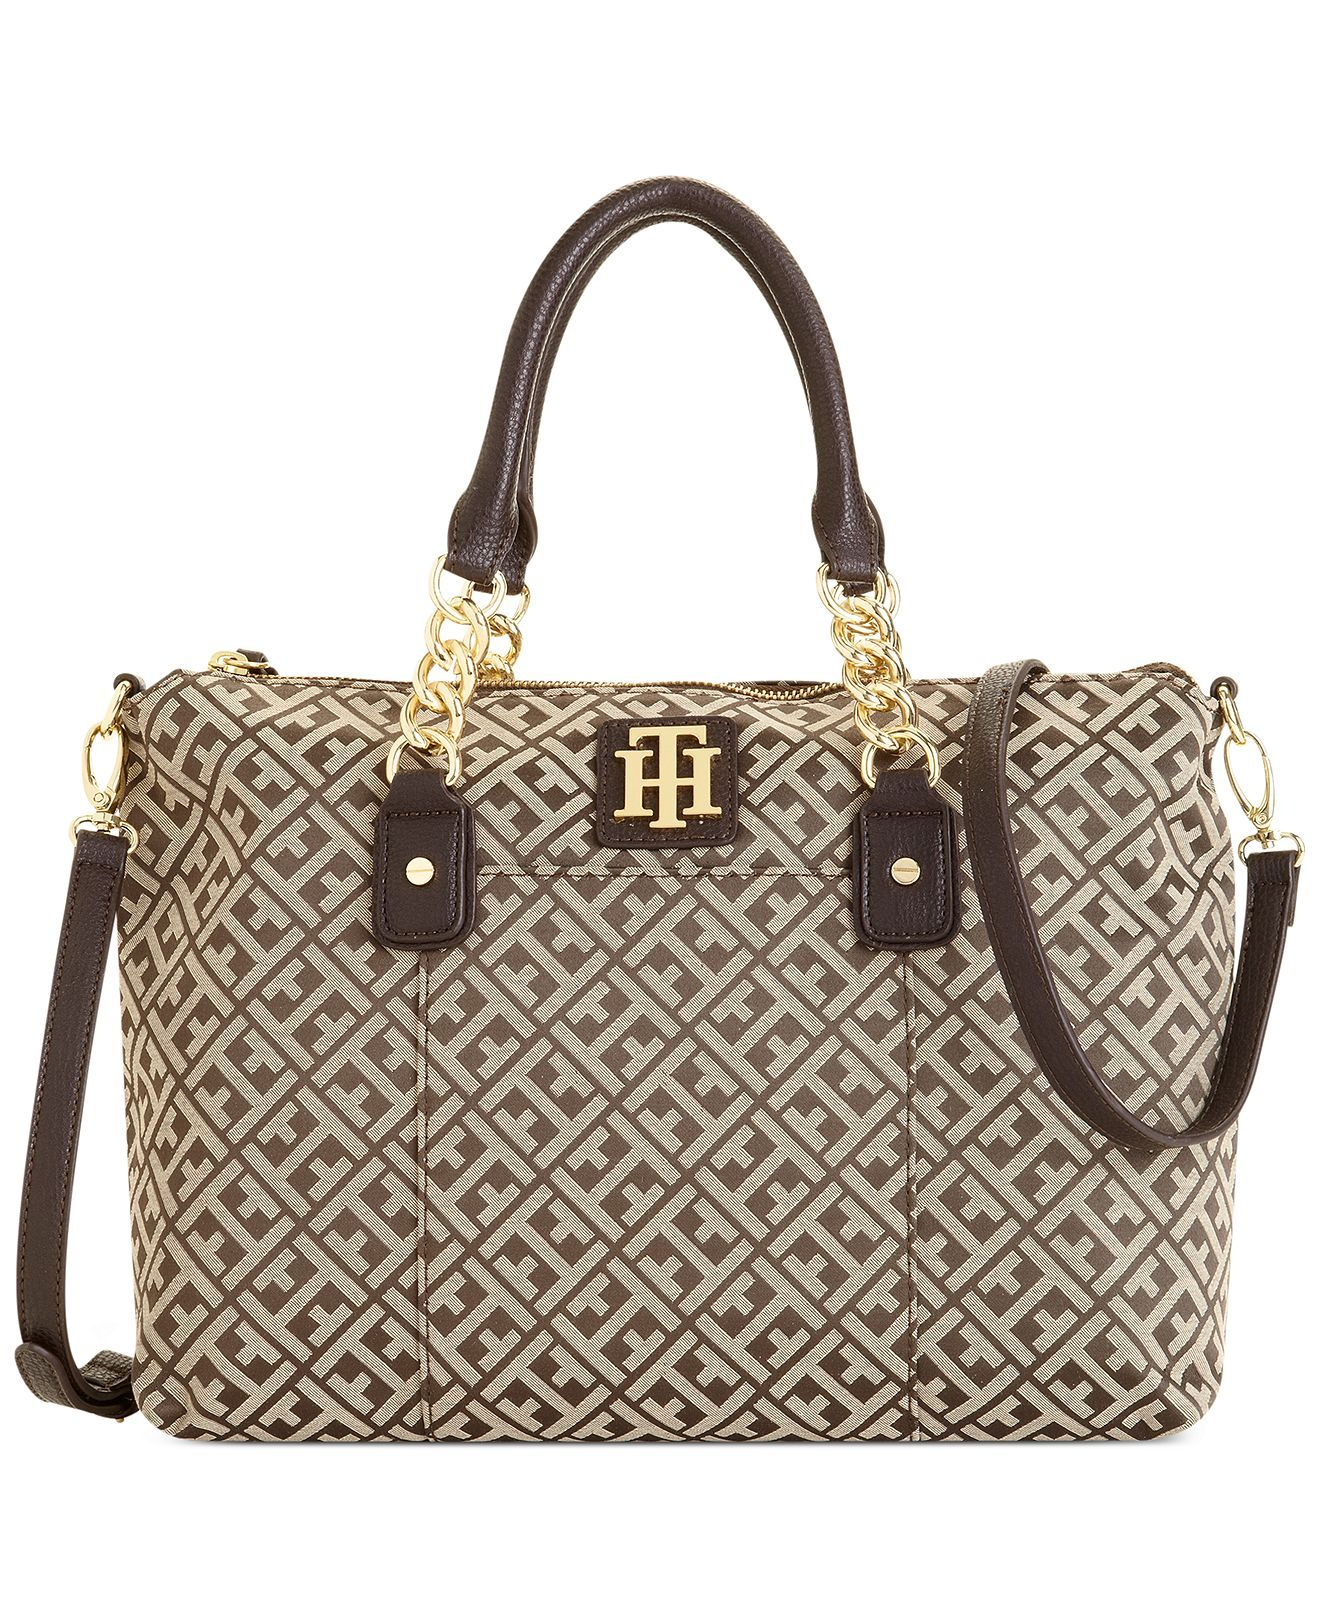 6155a4abd95 Tommy Hilfiger Bombay Convertible Shopper - All Handbags - Handbags    Accessories - Macy s